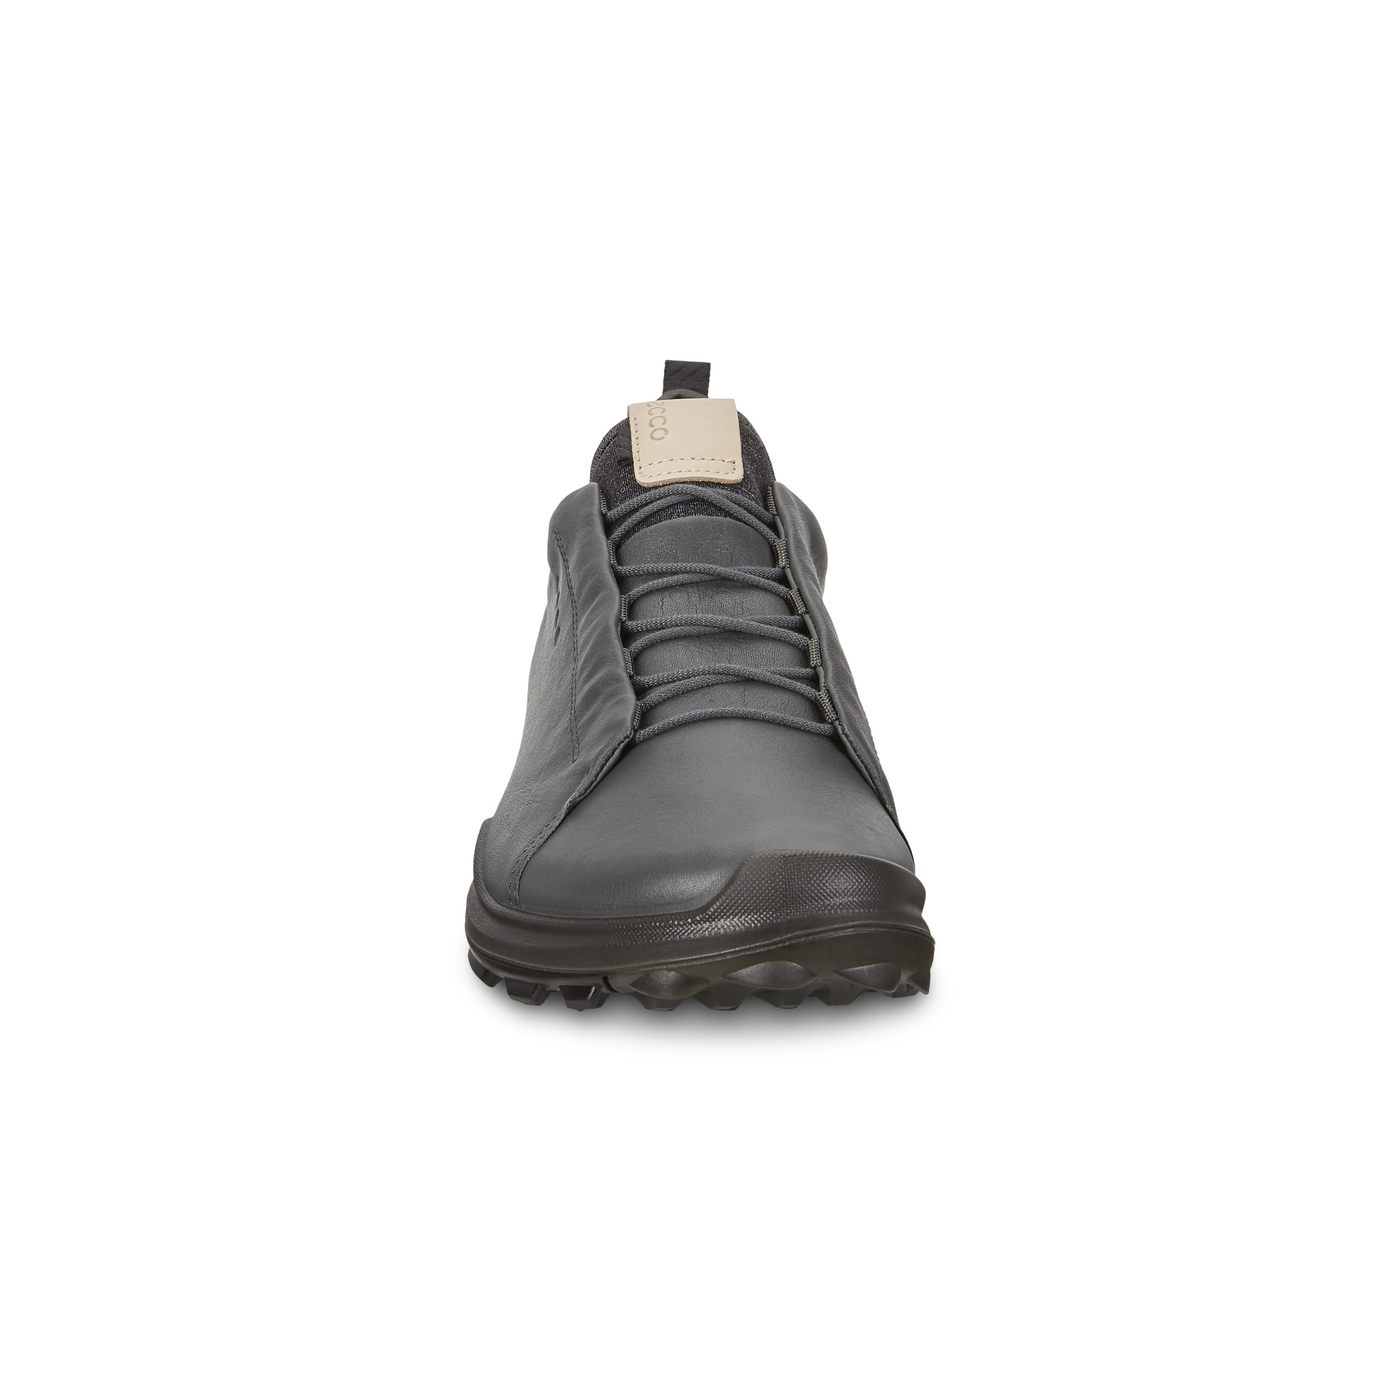 ECCO BIOM HYBRID 3 2.0 Men's Shoe